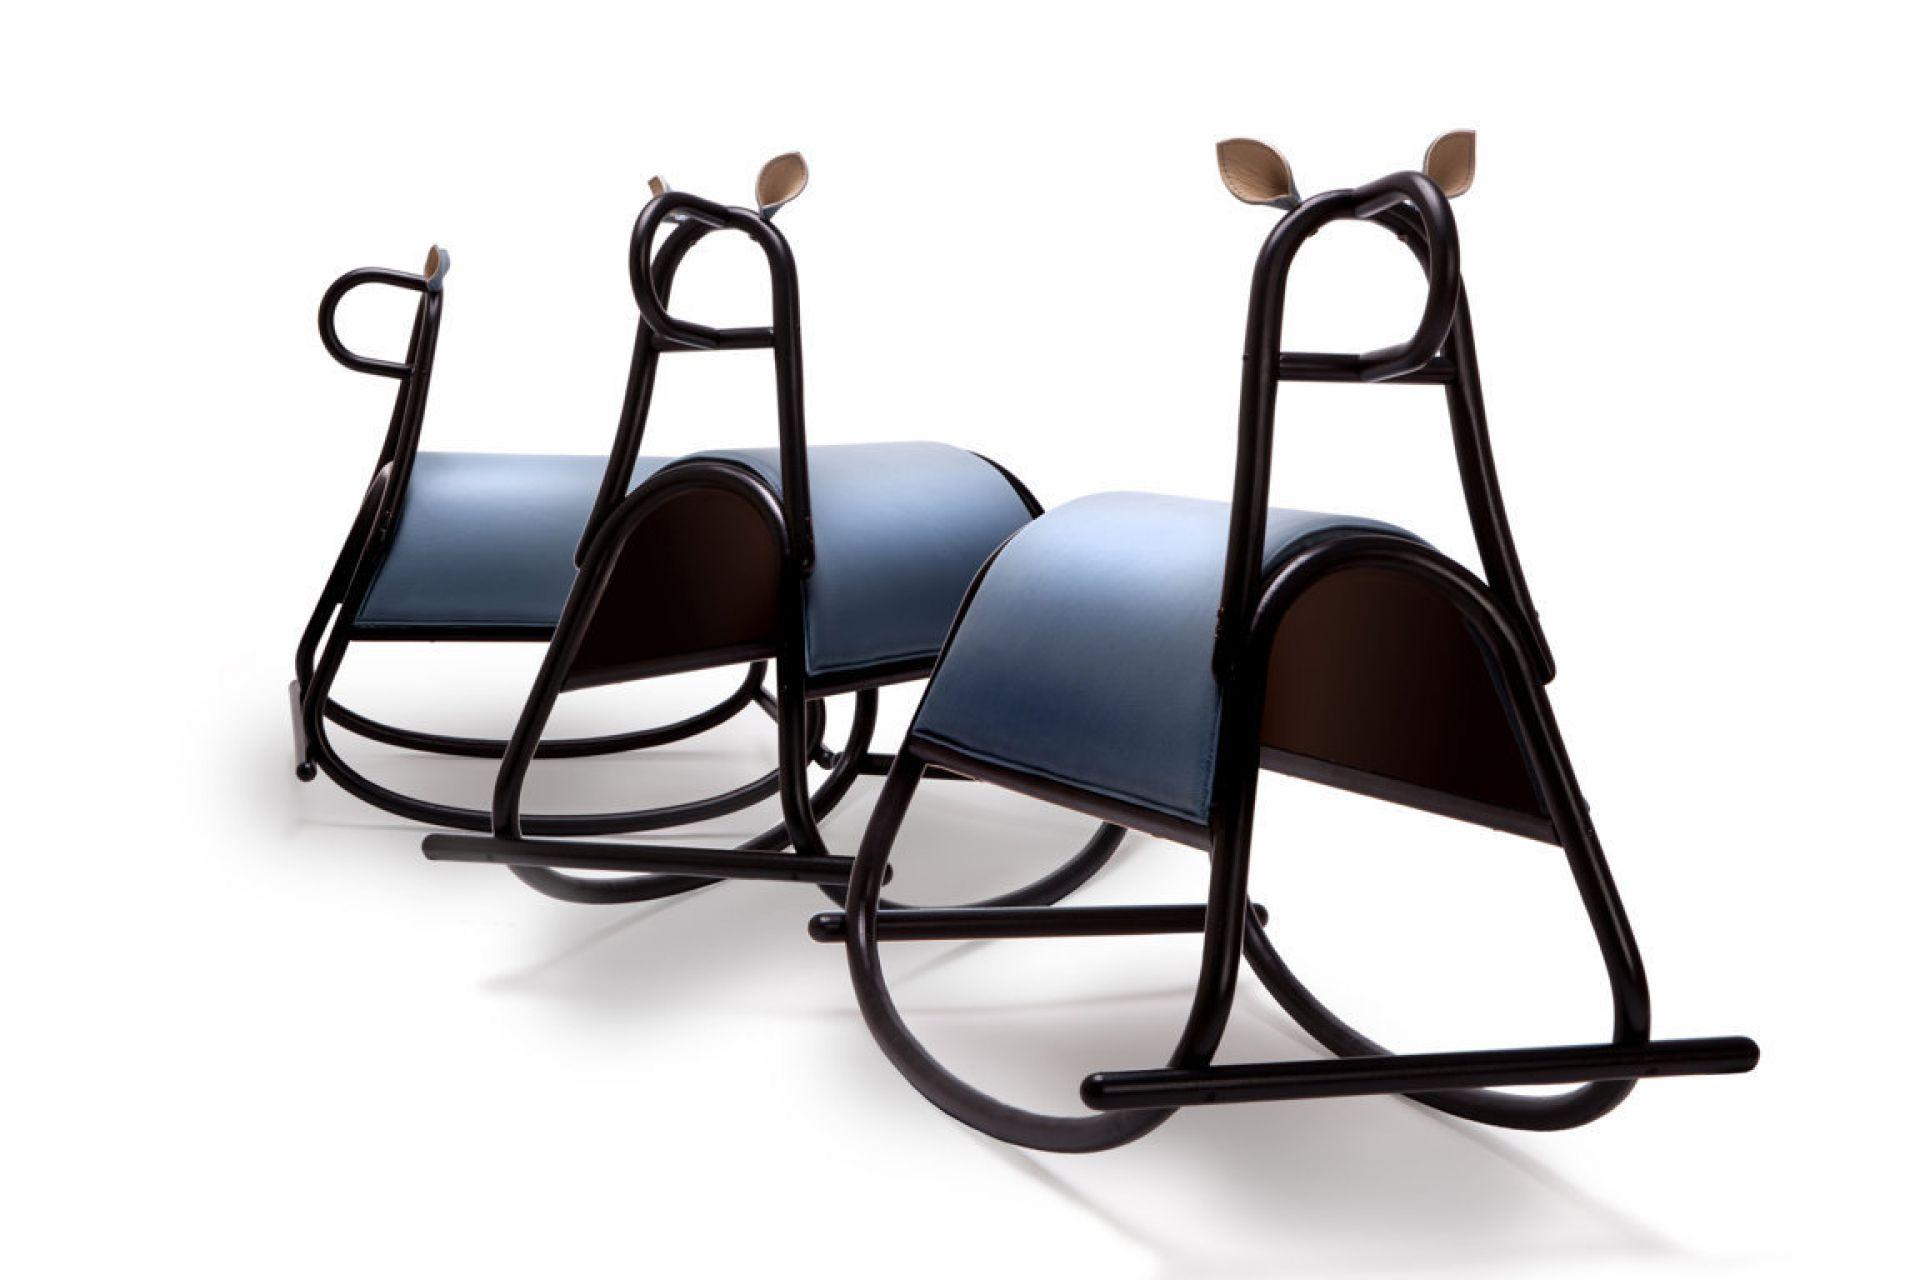 Furia Schaukelpferd Wiener GTV Design